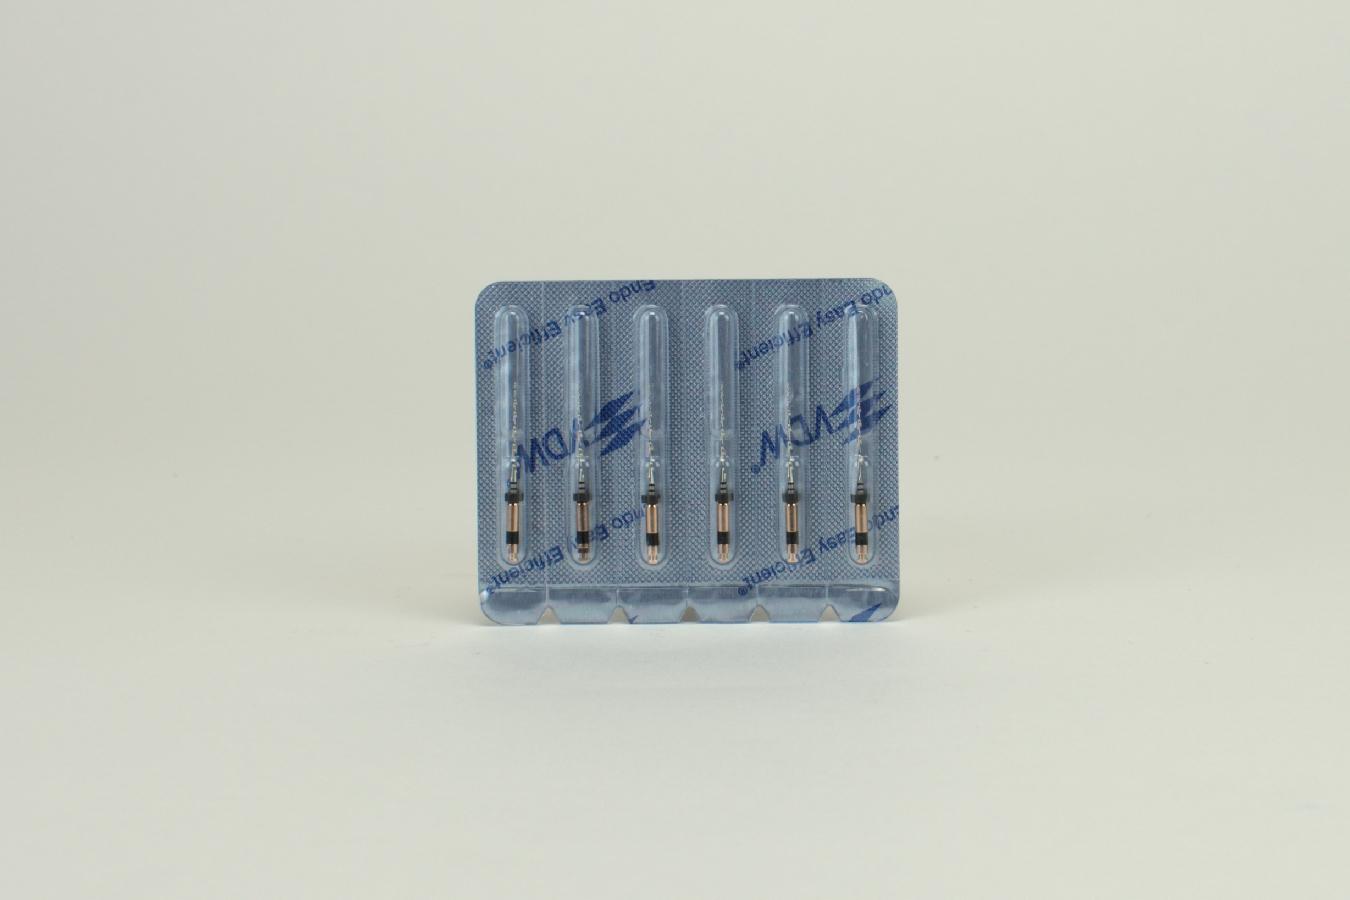 Reciproc NiTi-Feile R40 21mm 6 Stück